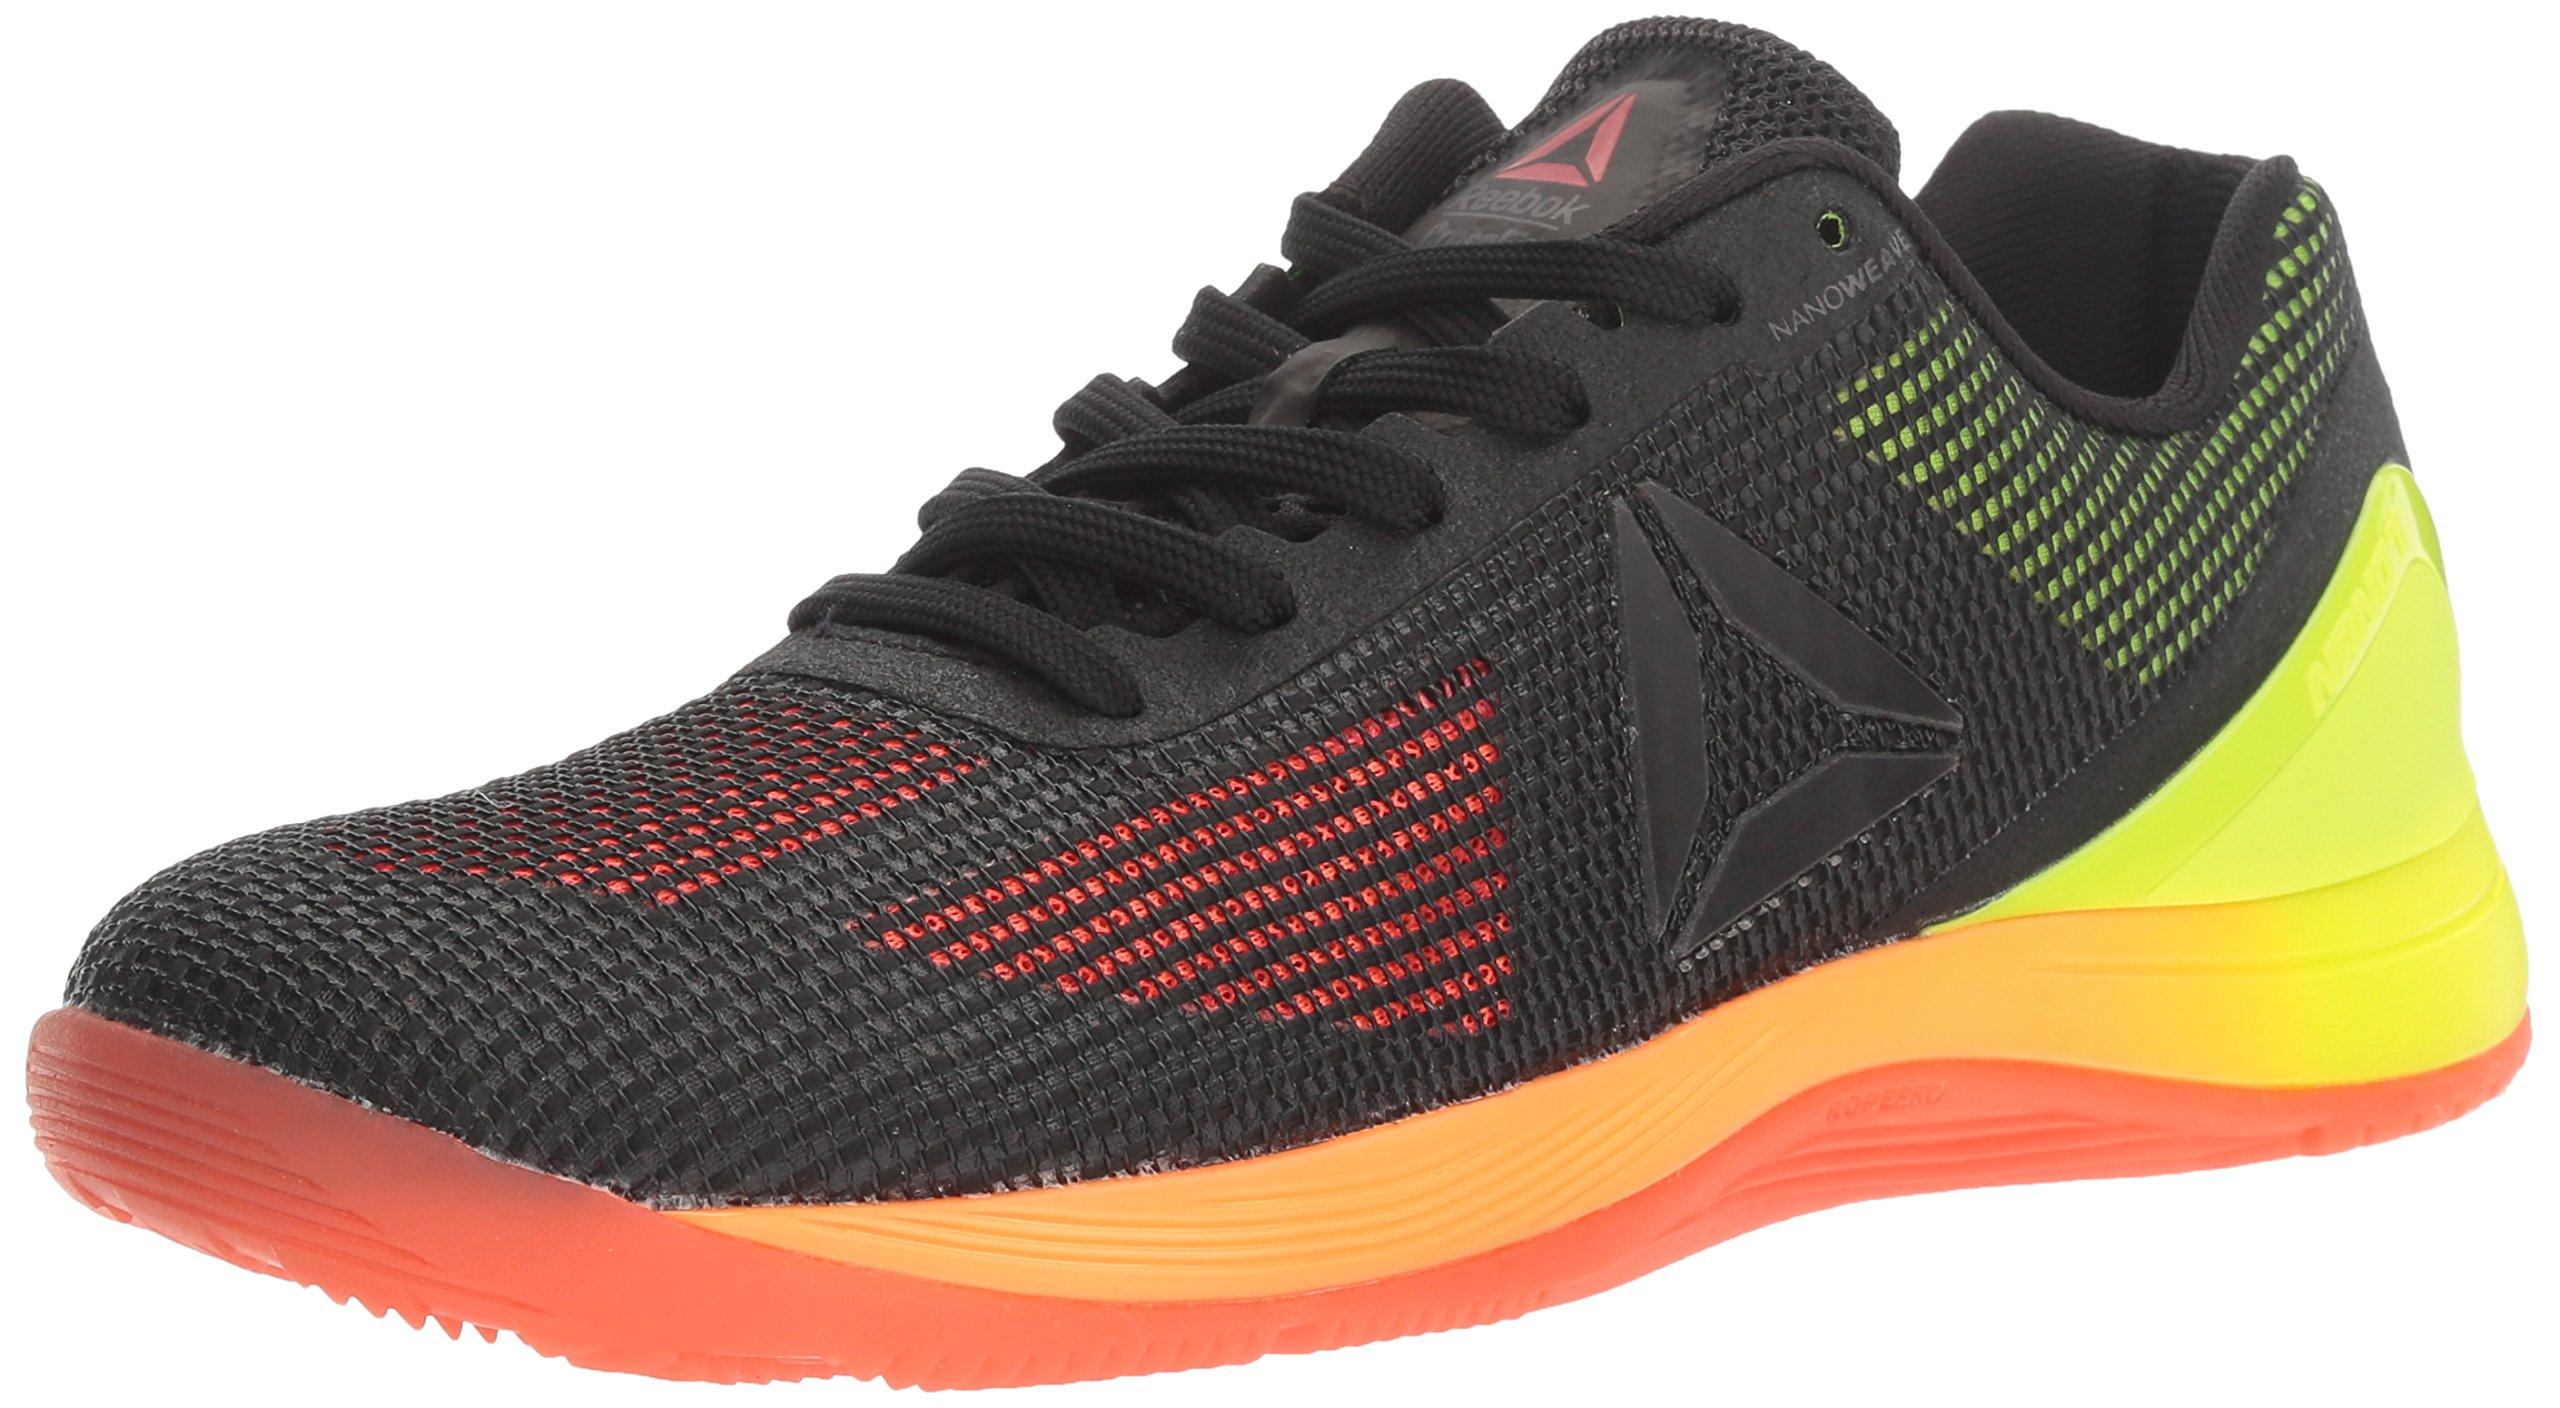 Reebok Women's CROSSFIT Nano 7.0 Cross-Trainer Shoe, Vitamin C/Solar Yellow/Black/Lead, 8 M US